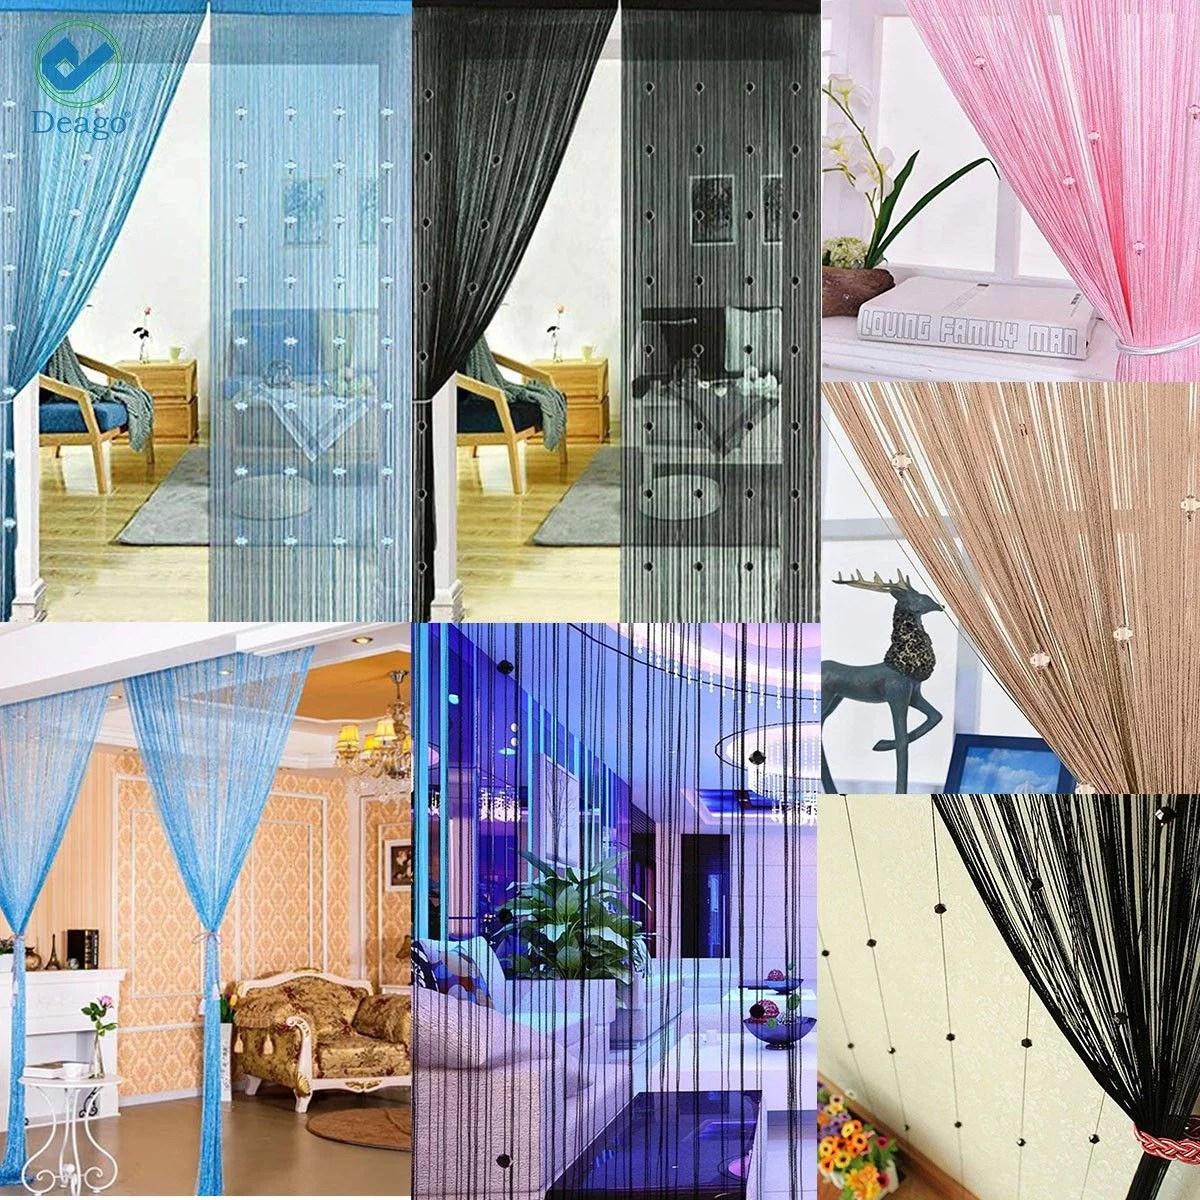 deago 39 x78 crystal beaded curtain door string curtain wall panel fringe window room divider blind divider tassel screen home decor black